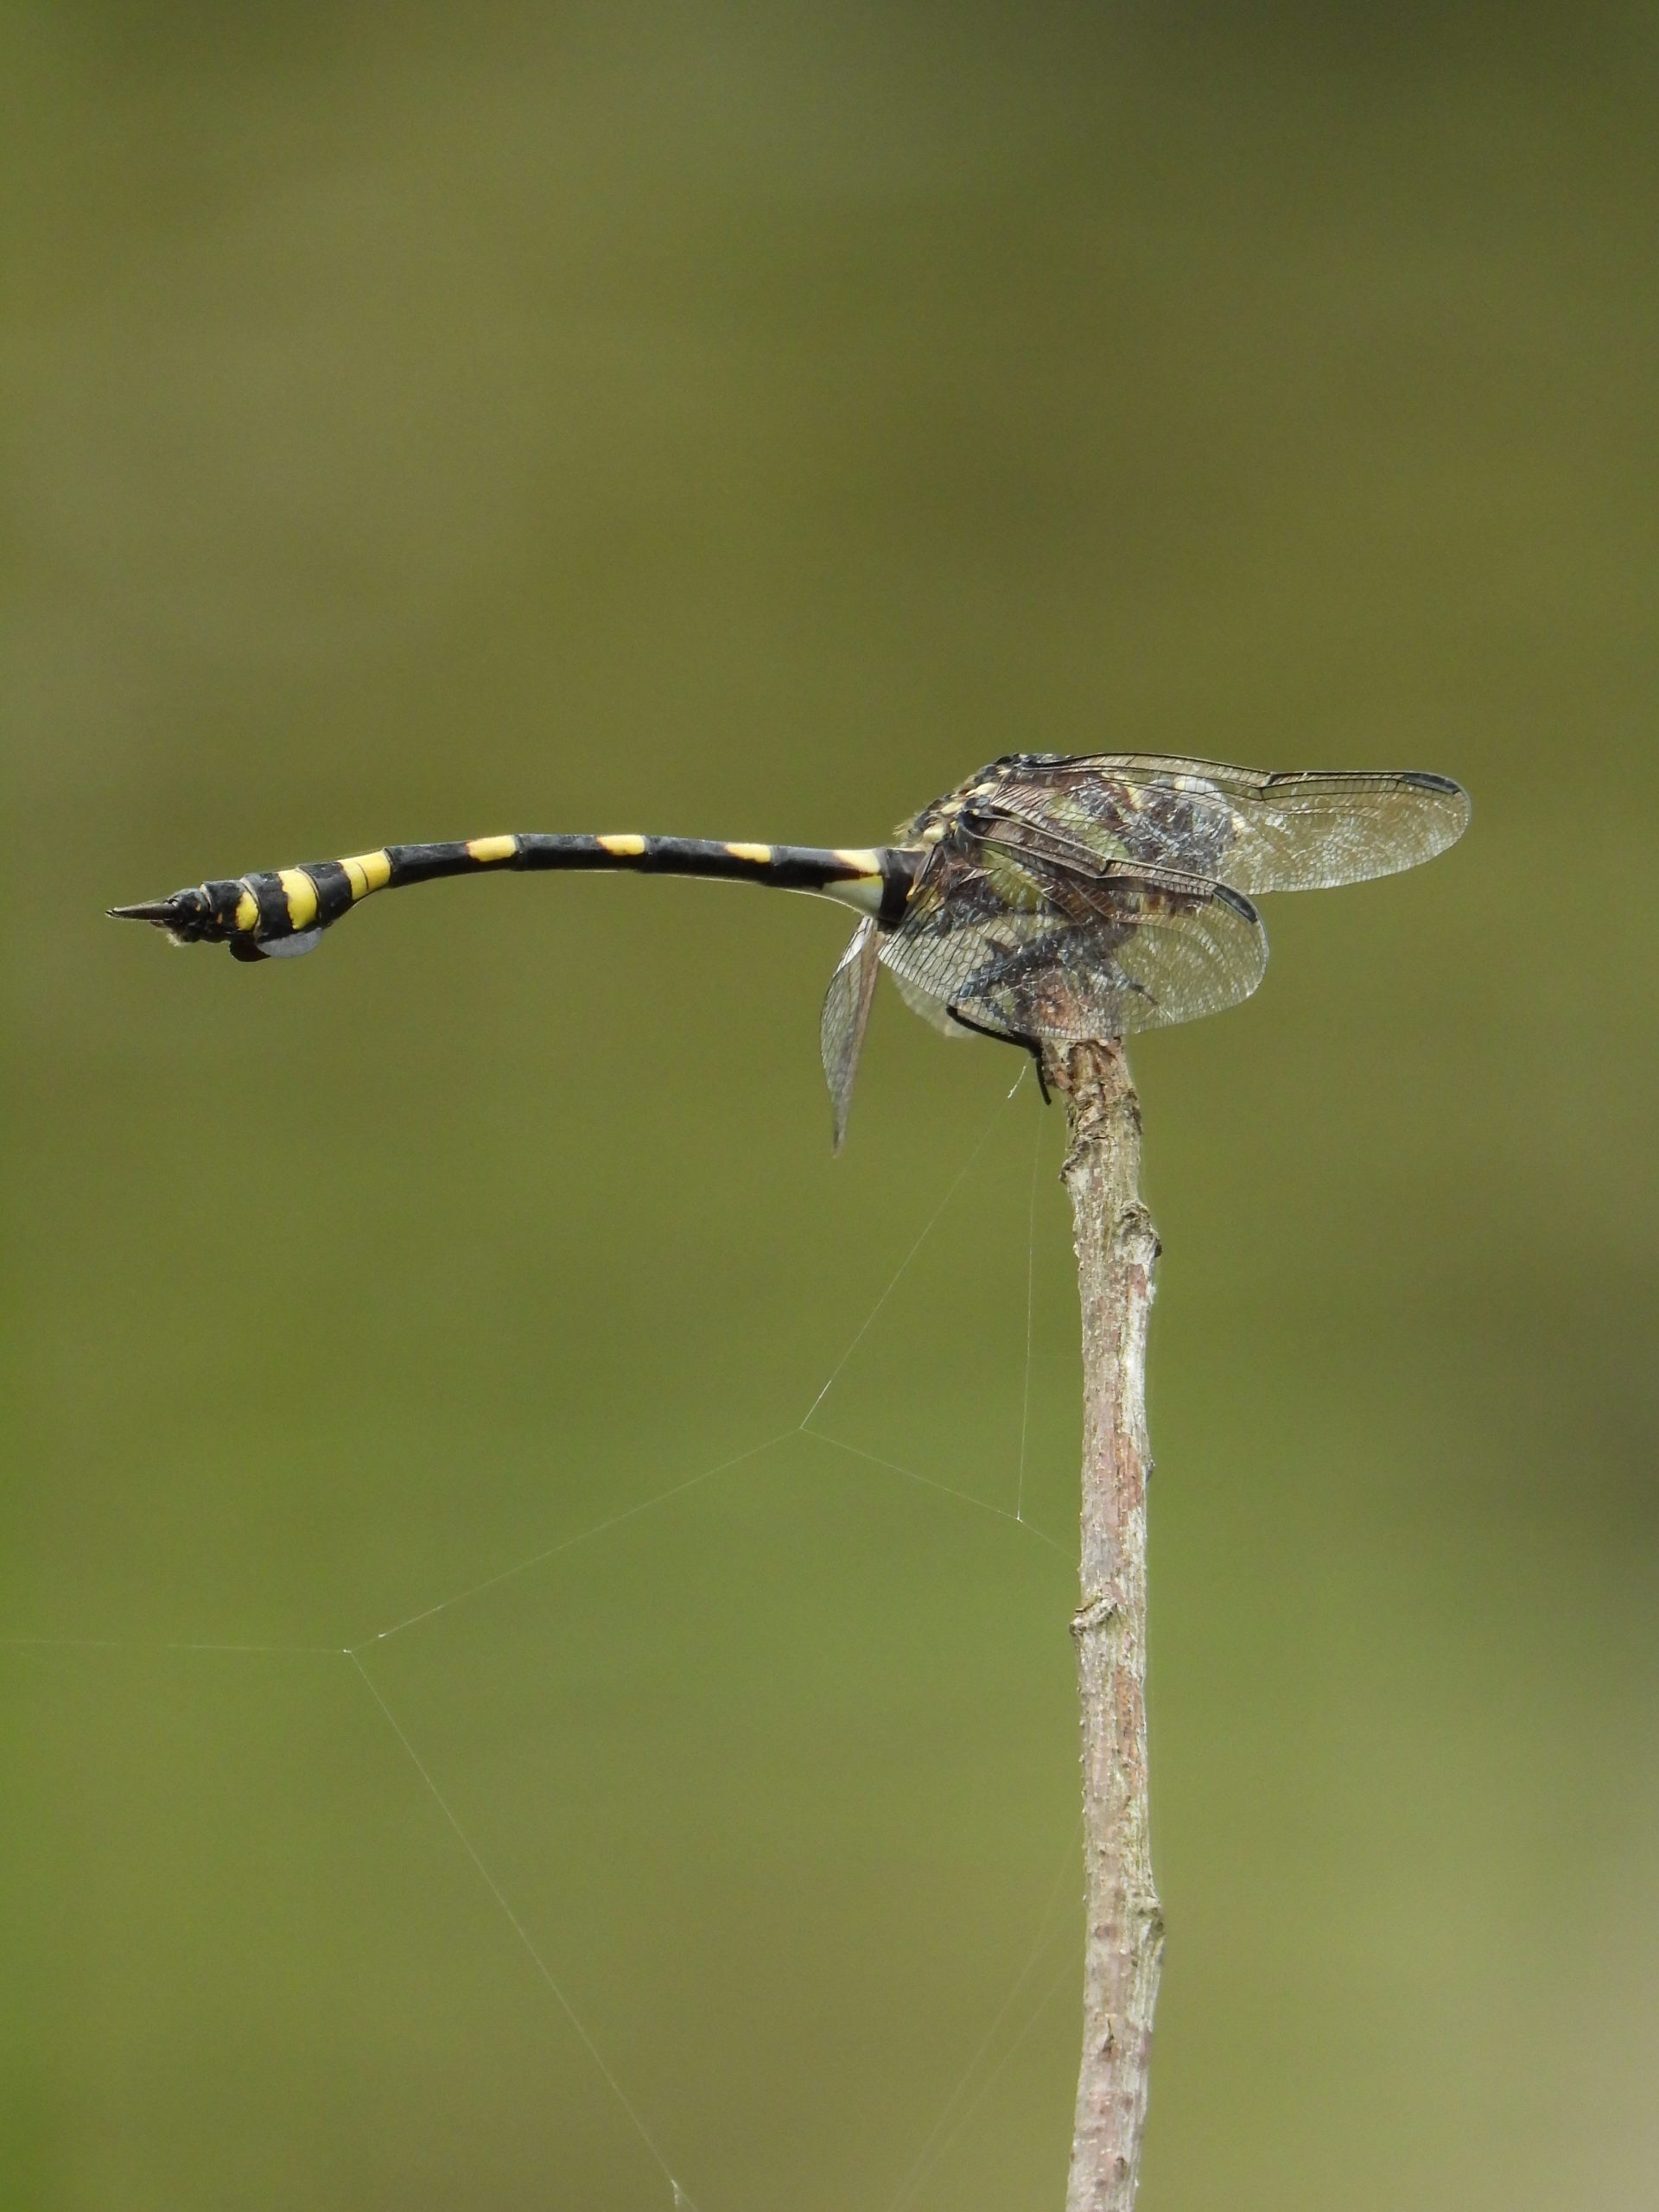 Ictinogomphus australis on a twig